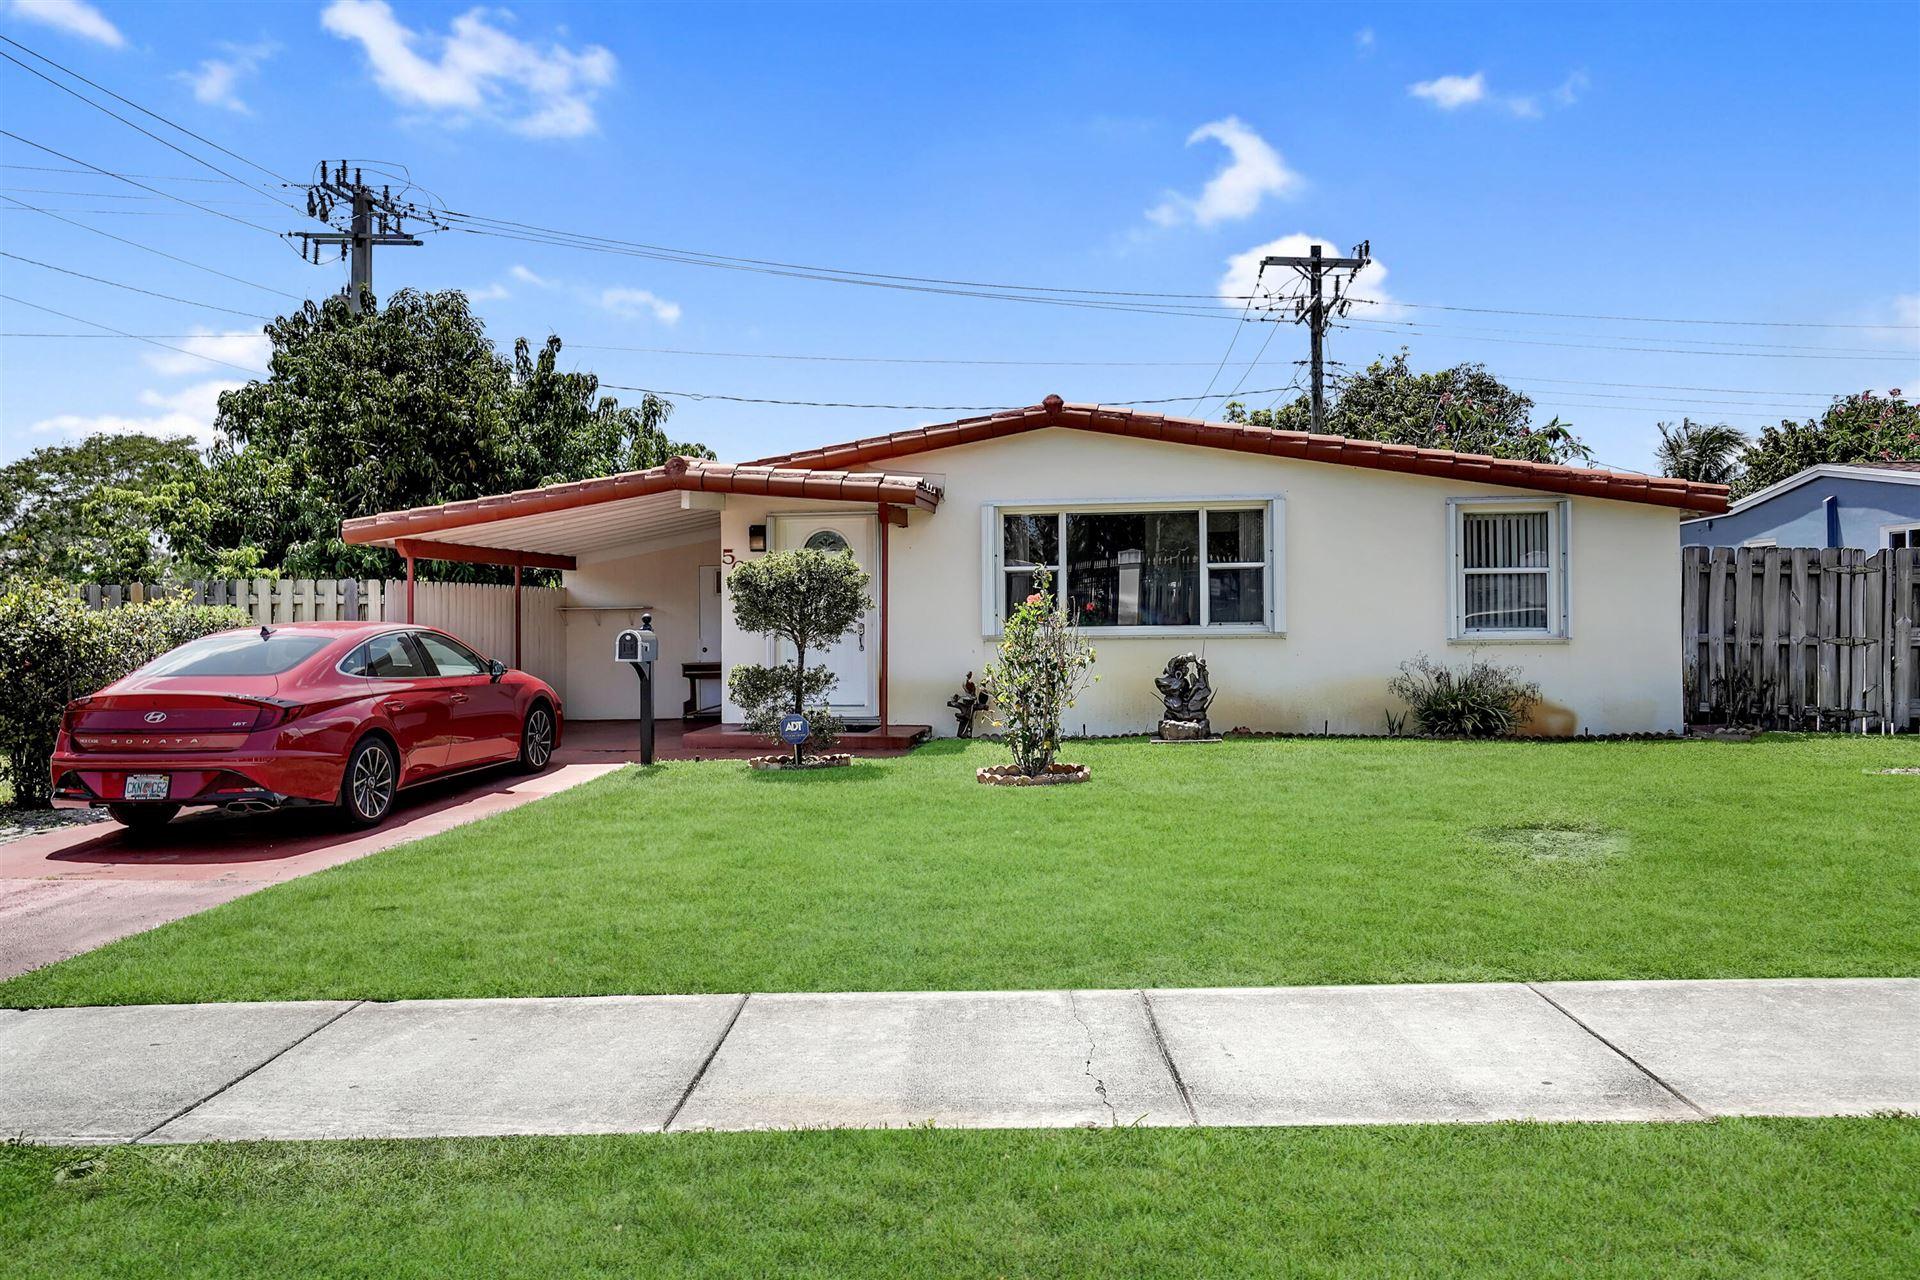 5601 NE 9 Avenue, Oakland Park, FL 33334 - #: RX-10714225